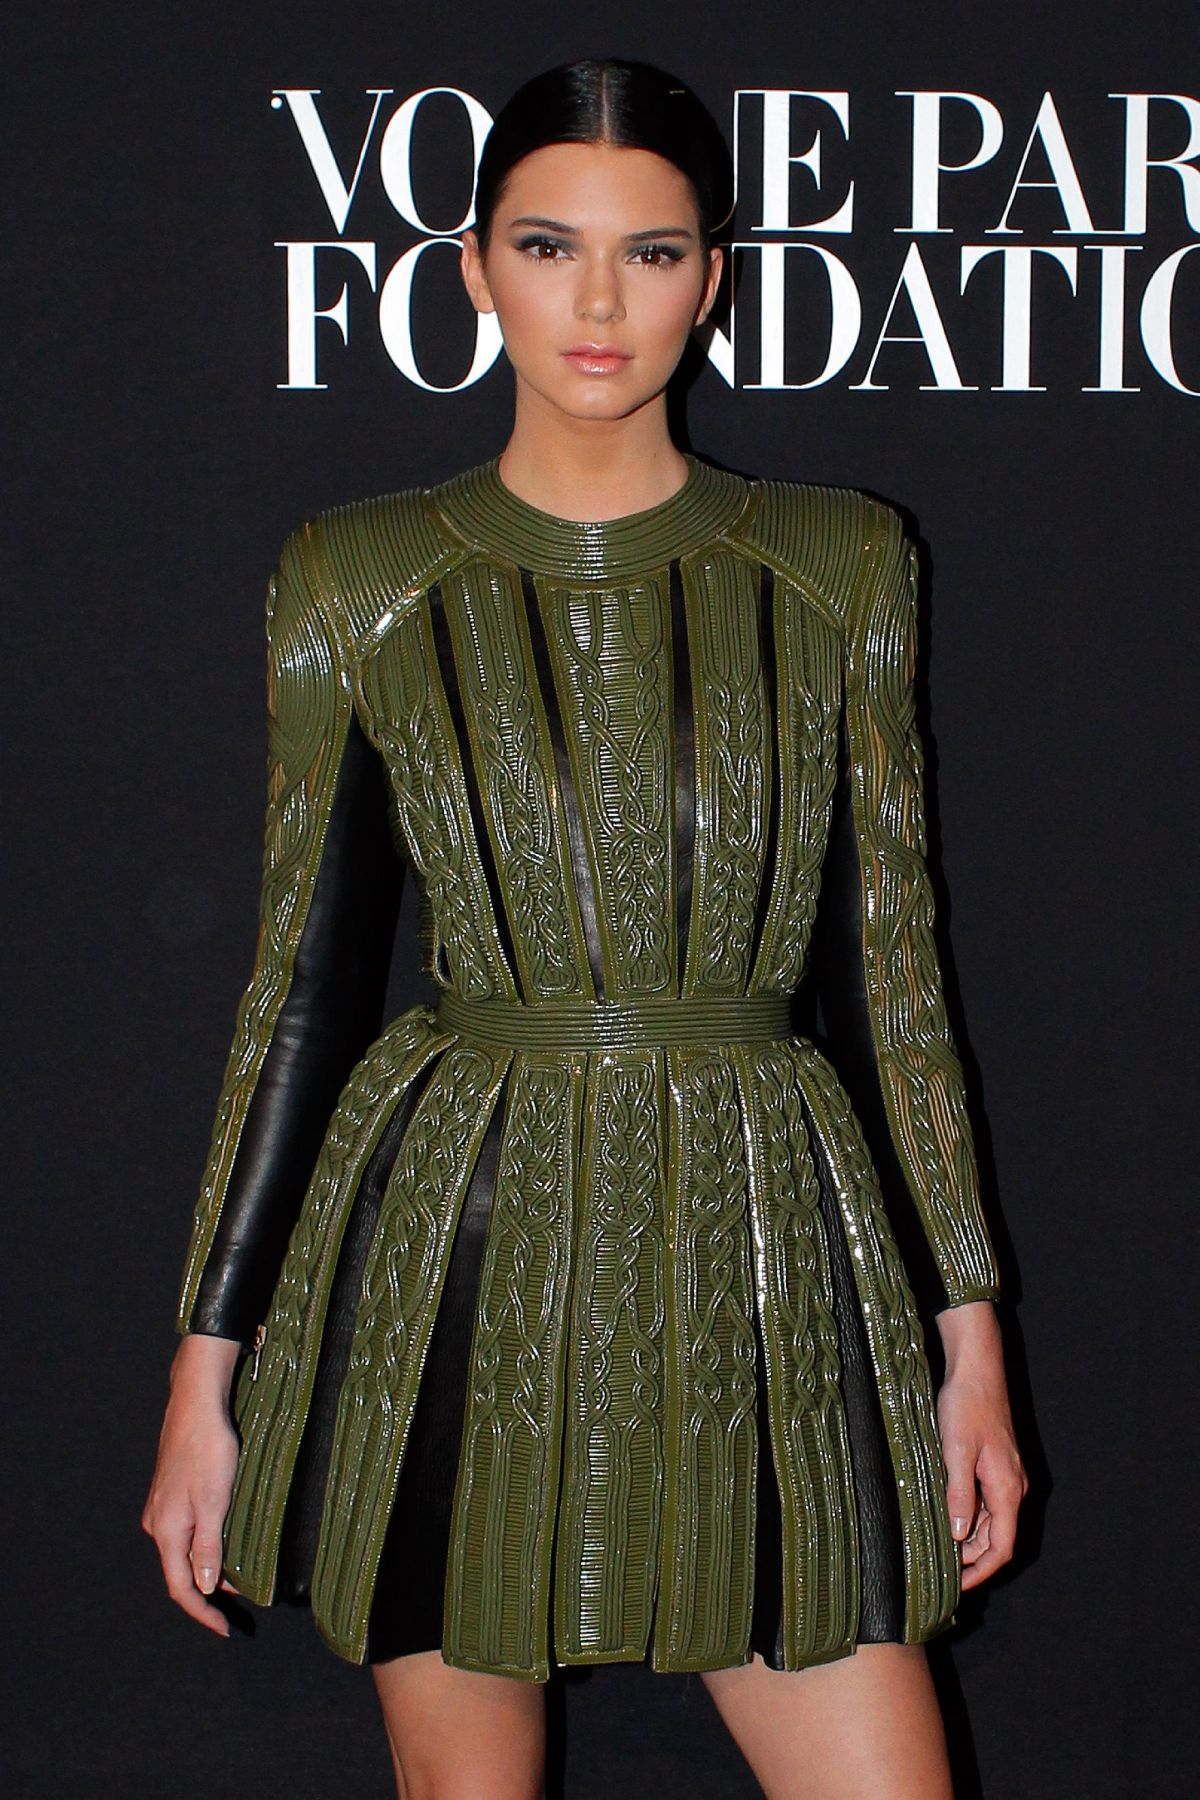 eb0e0e3795b KENDALL JENNER at Vogue Foundation Gala Dinner – HawtCelebs